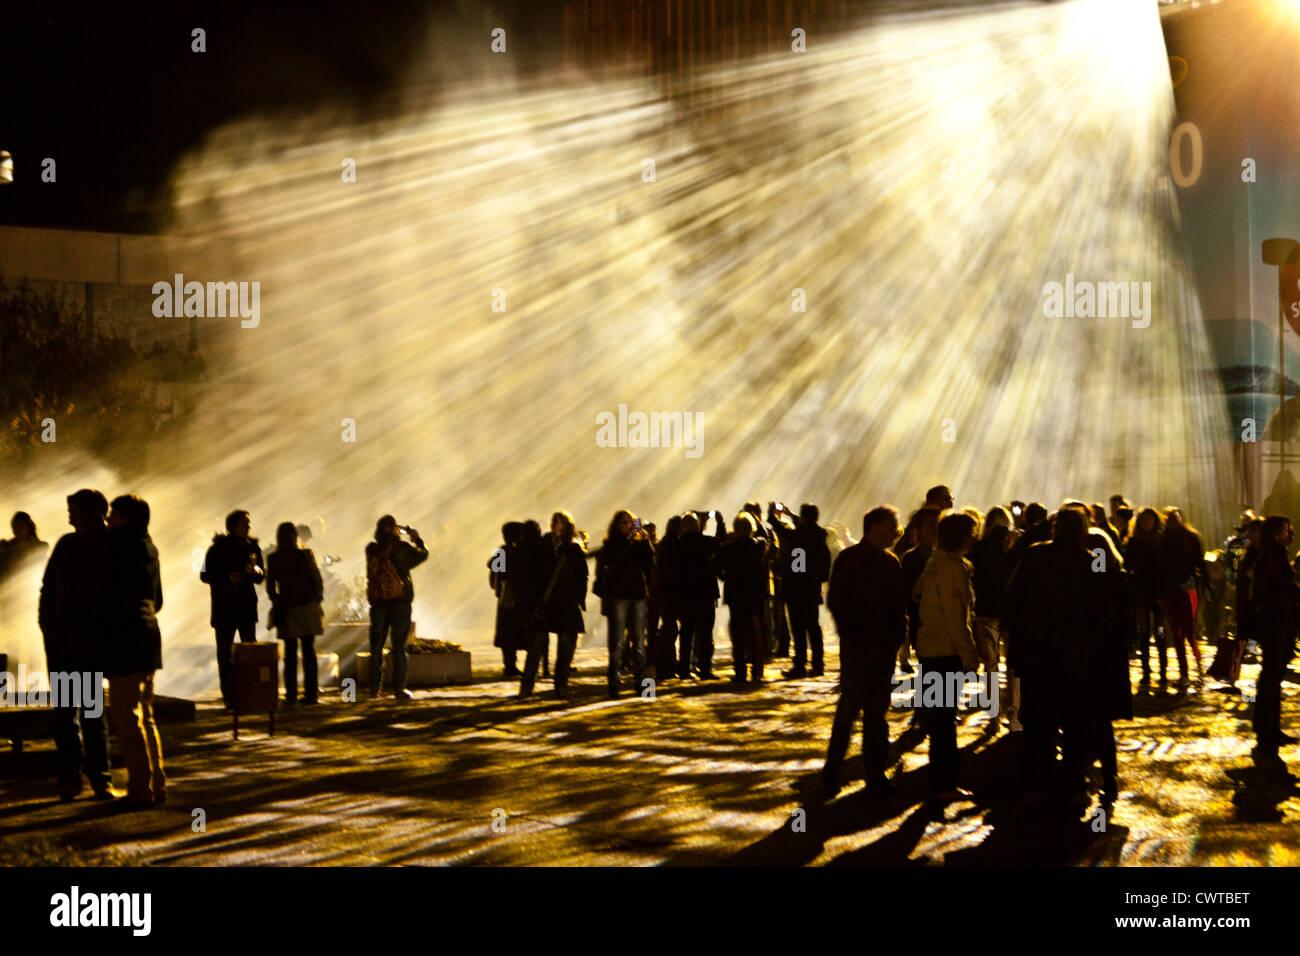 Le persone al Luminale, Frankfurt am Main, Germania Immagini Stock